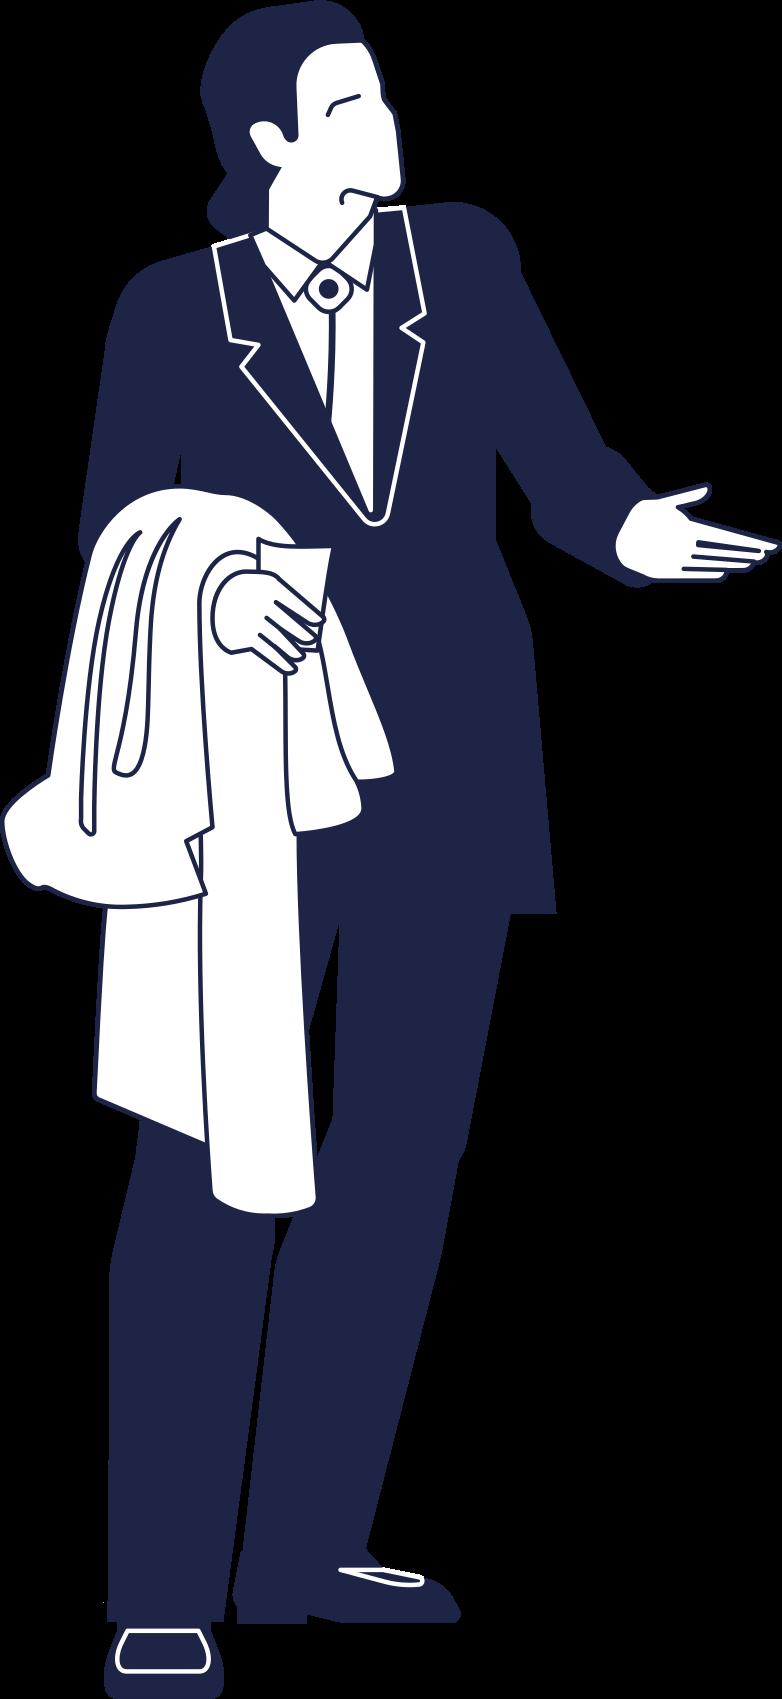 john travolta line Clipart illustration in PNG, SVG